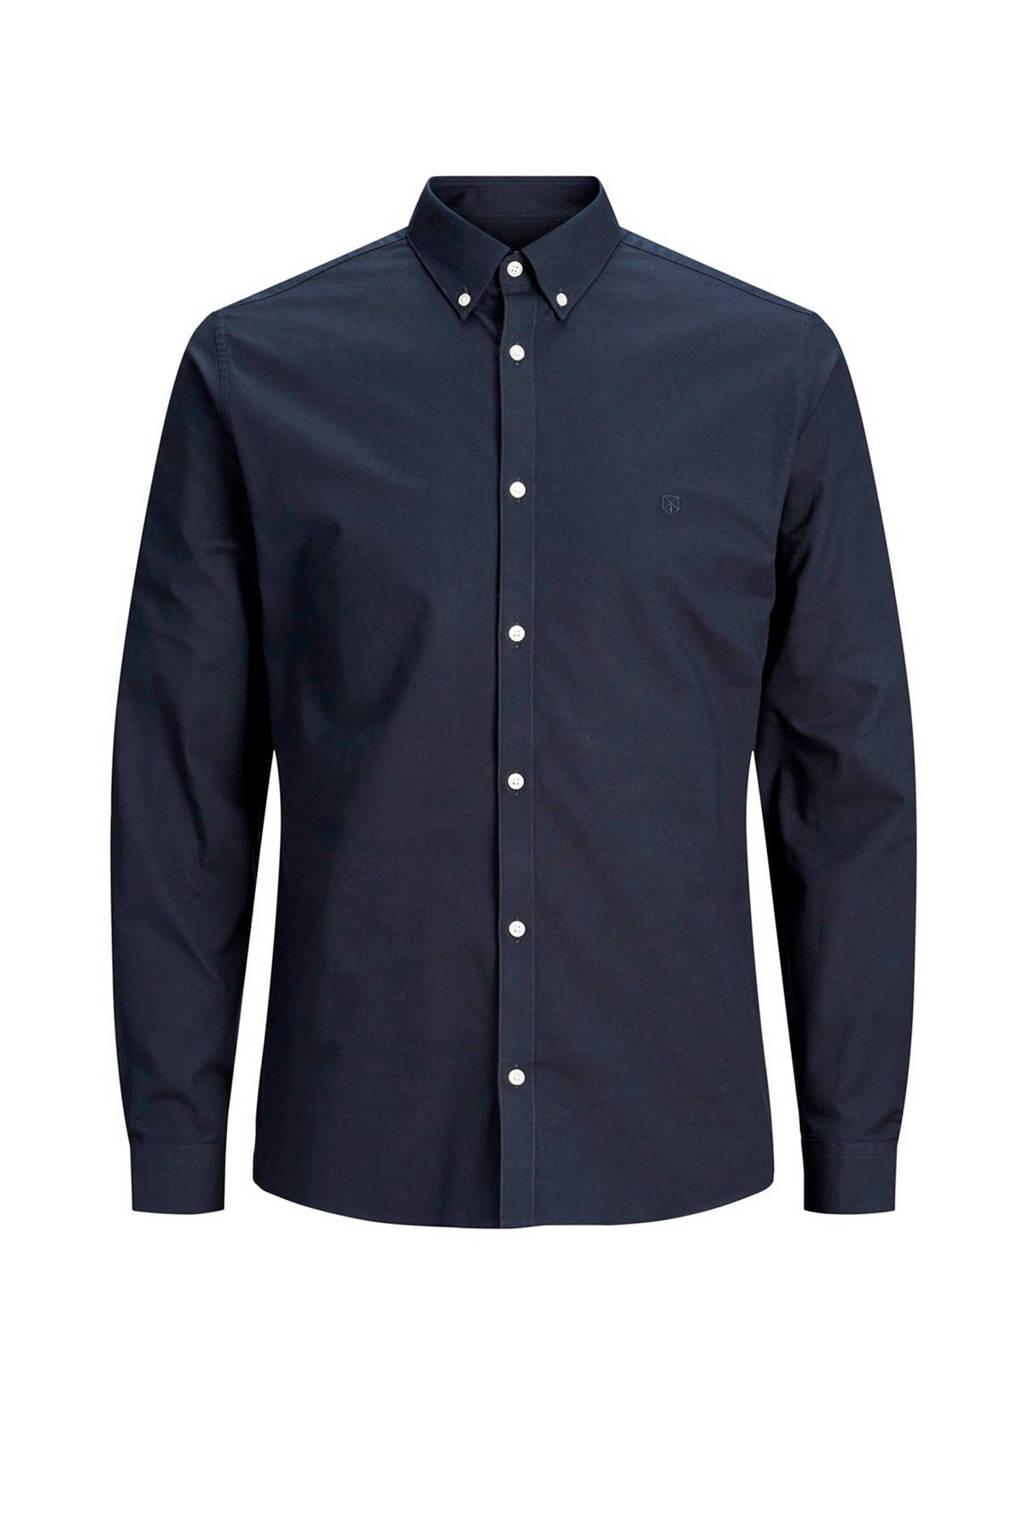 Jack & Jones Premium overhemd, Marine blauw